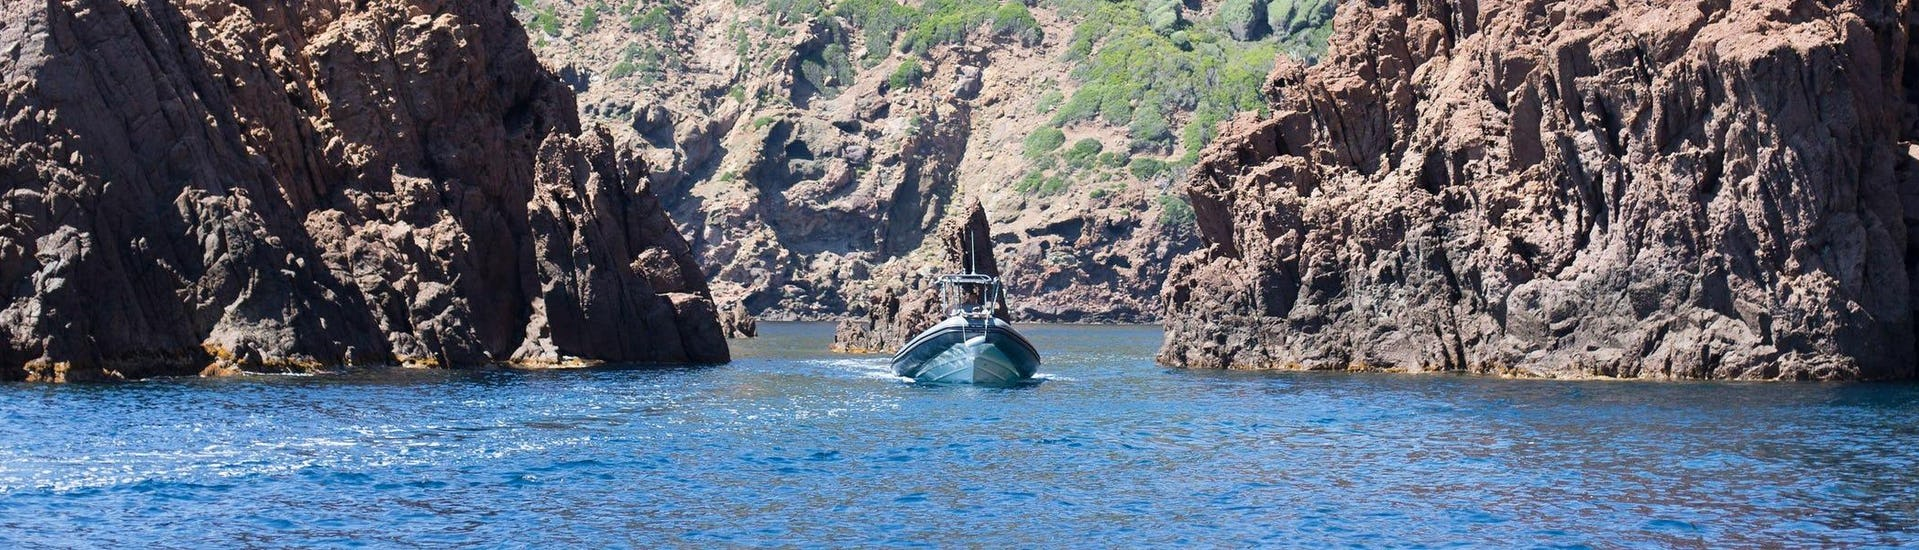 A group is enjoying the Boat Tour in Golfe de Porto - Réserve de Scandola operated by Avventu Event's.